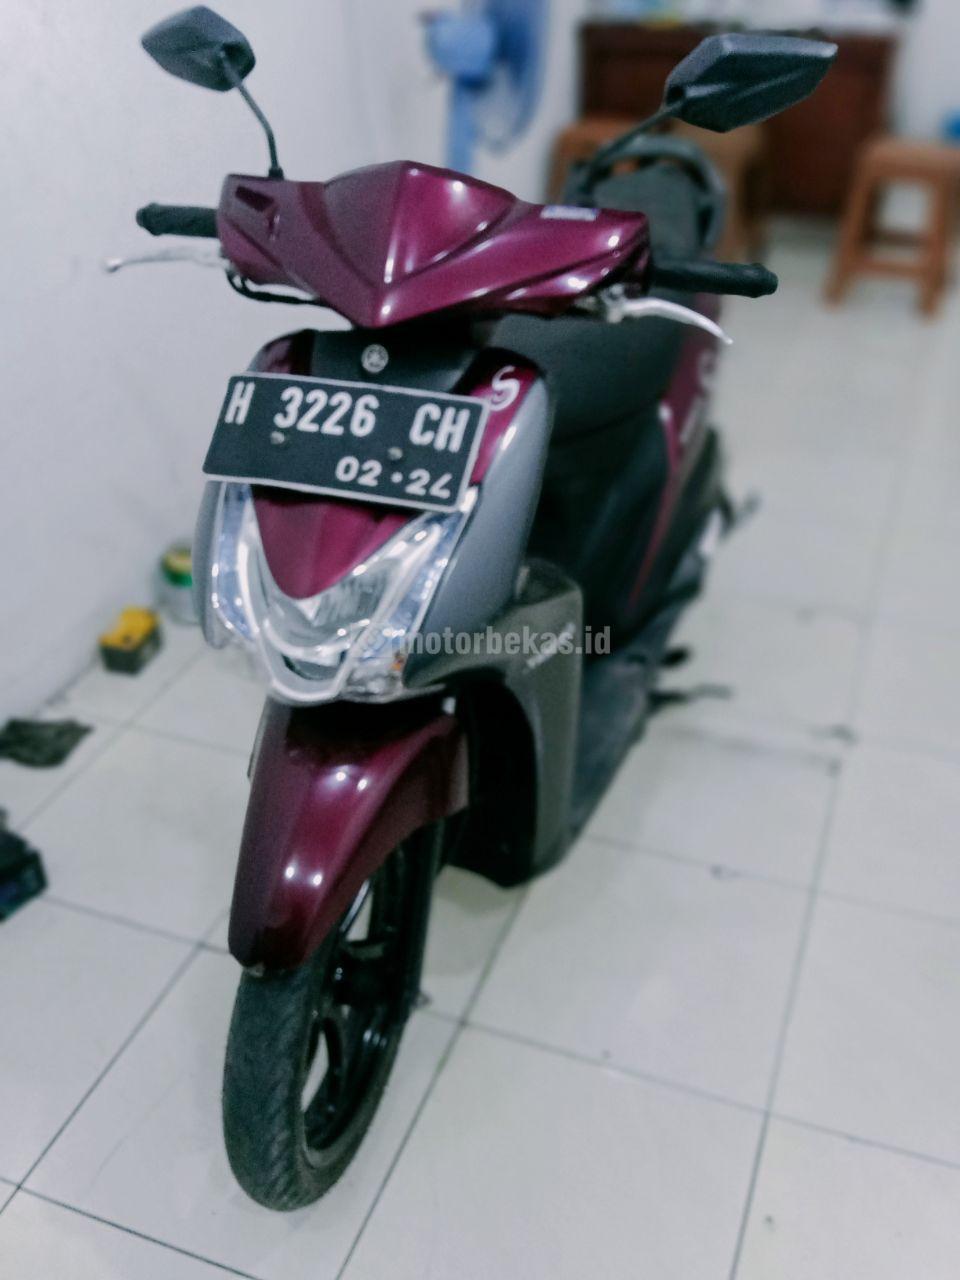 YAMAHA MIO S  2871 motorbekas.id